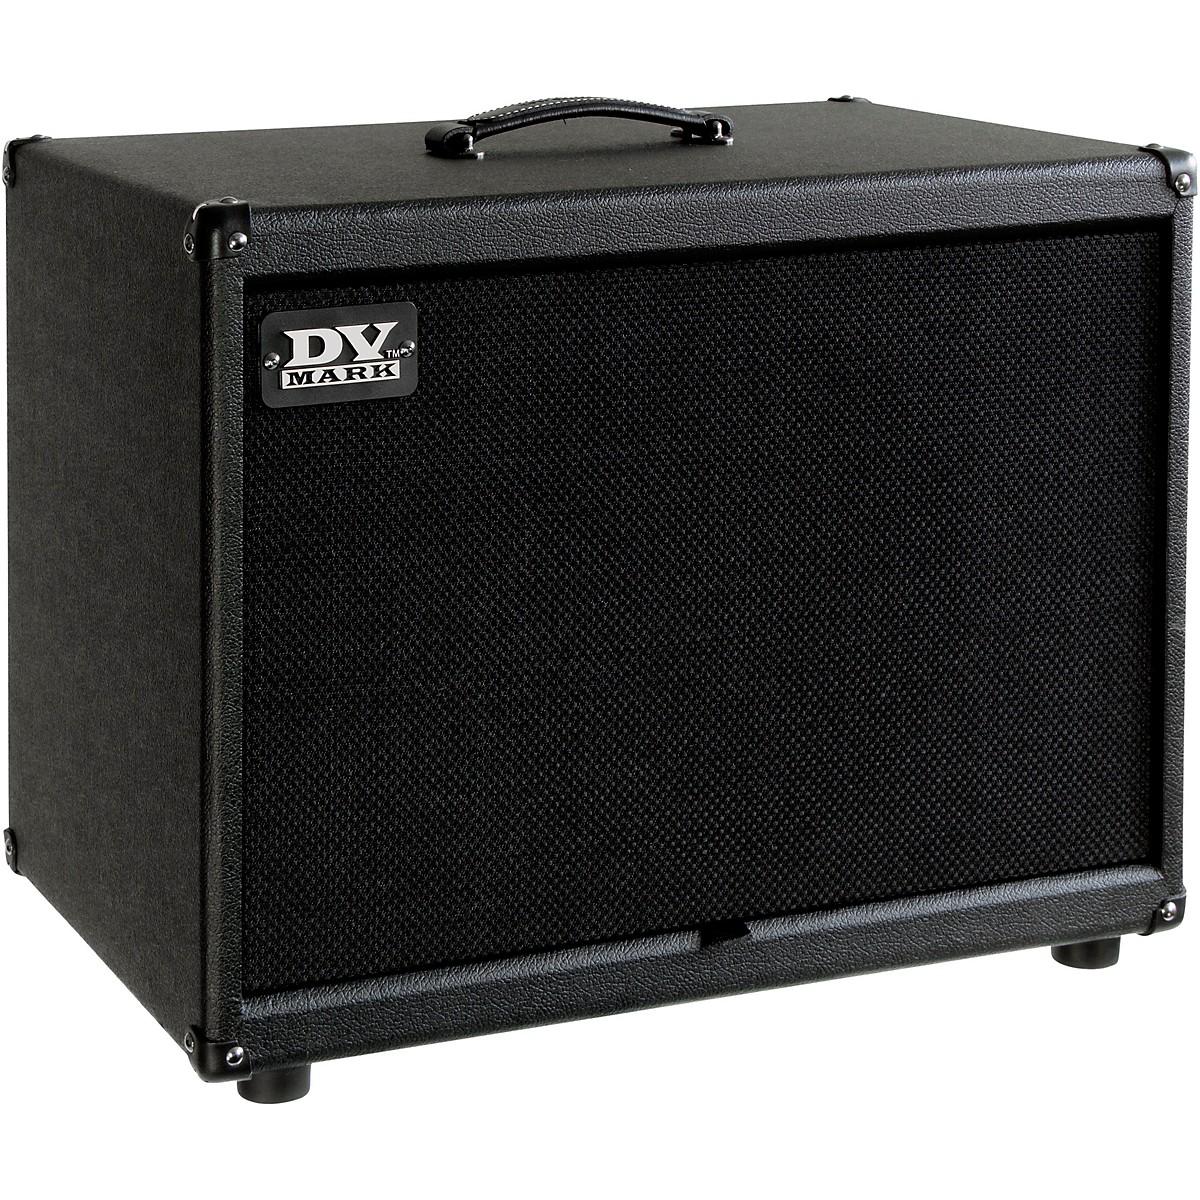 DV Mark DV 112 Plus 150W 1x12 Guitar Speaker Cabinet